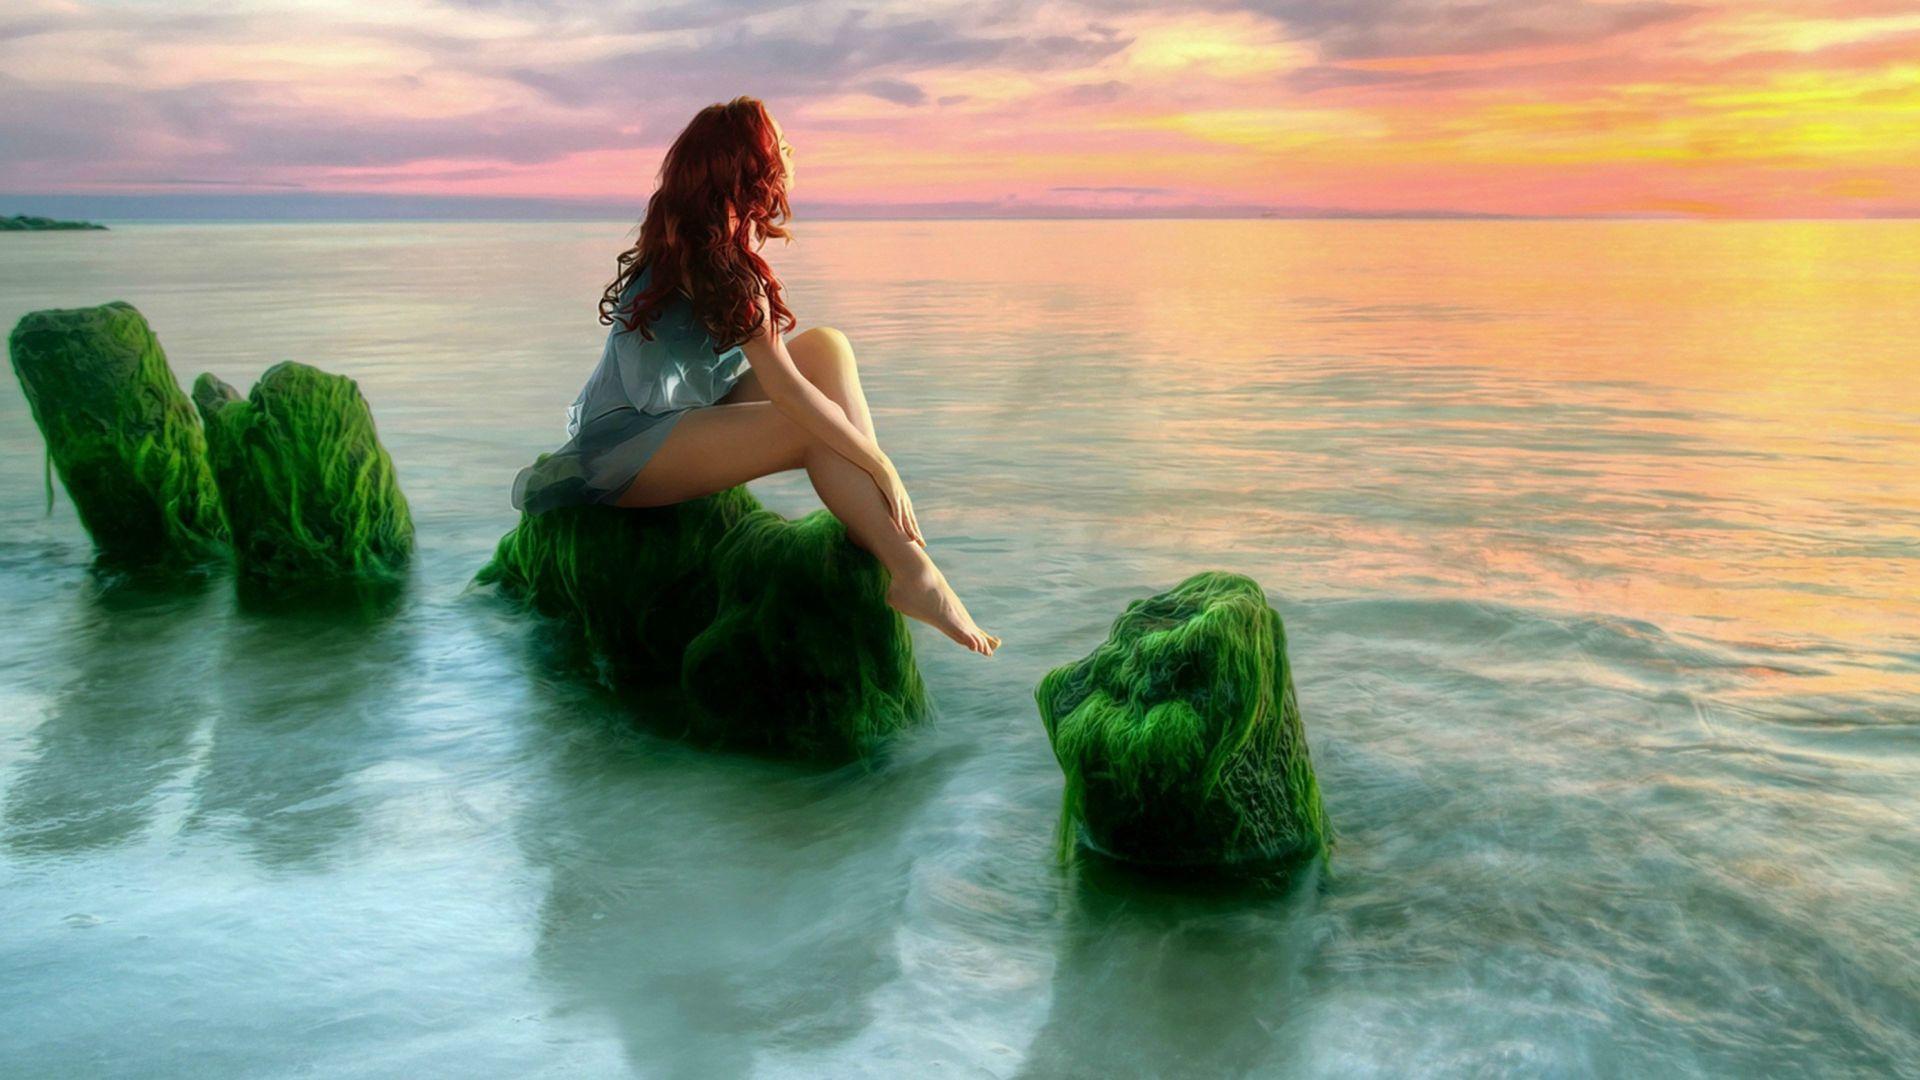 beauty-girl-sea-sunset-relax-desktop-hd-wallpaper-beauty